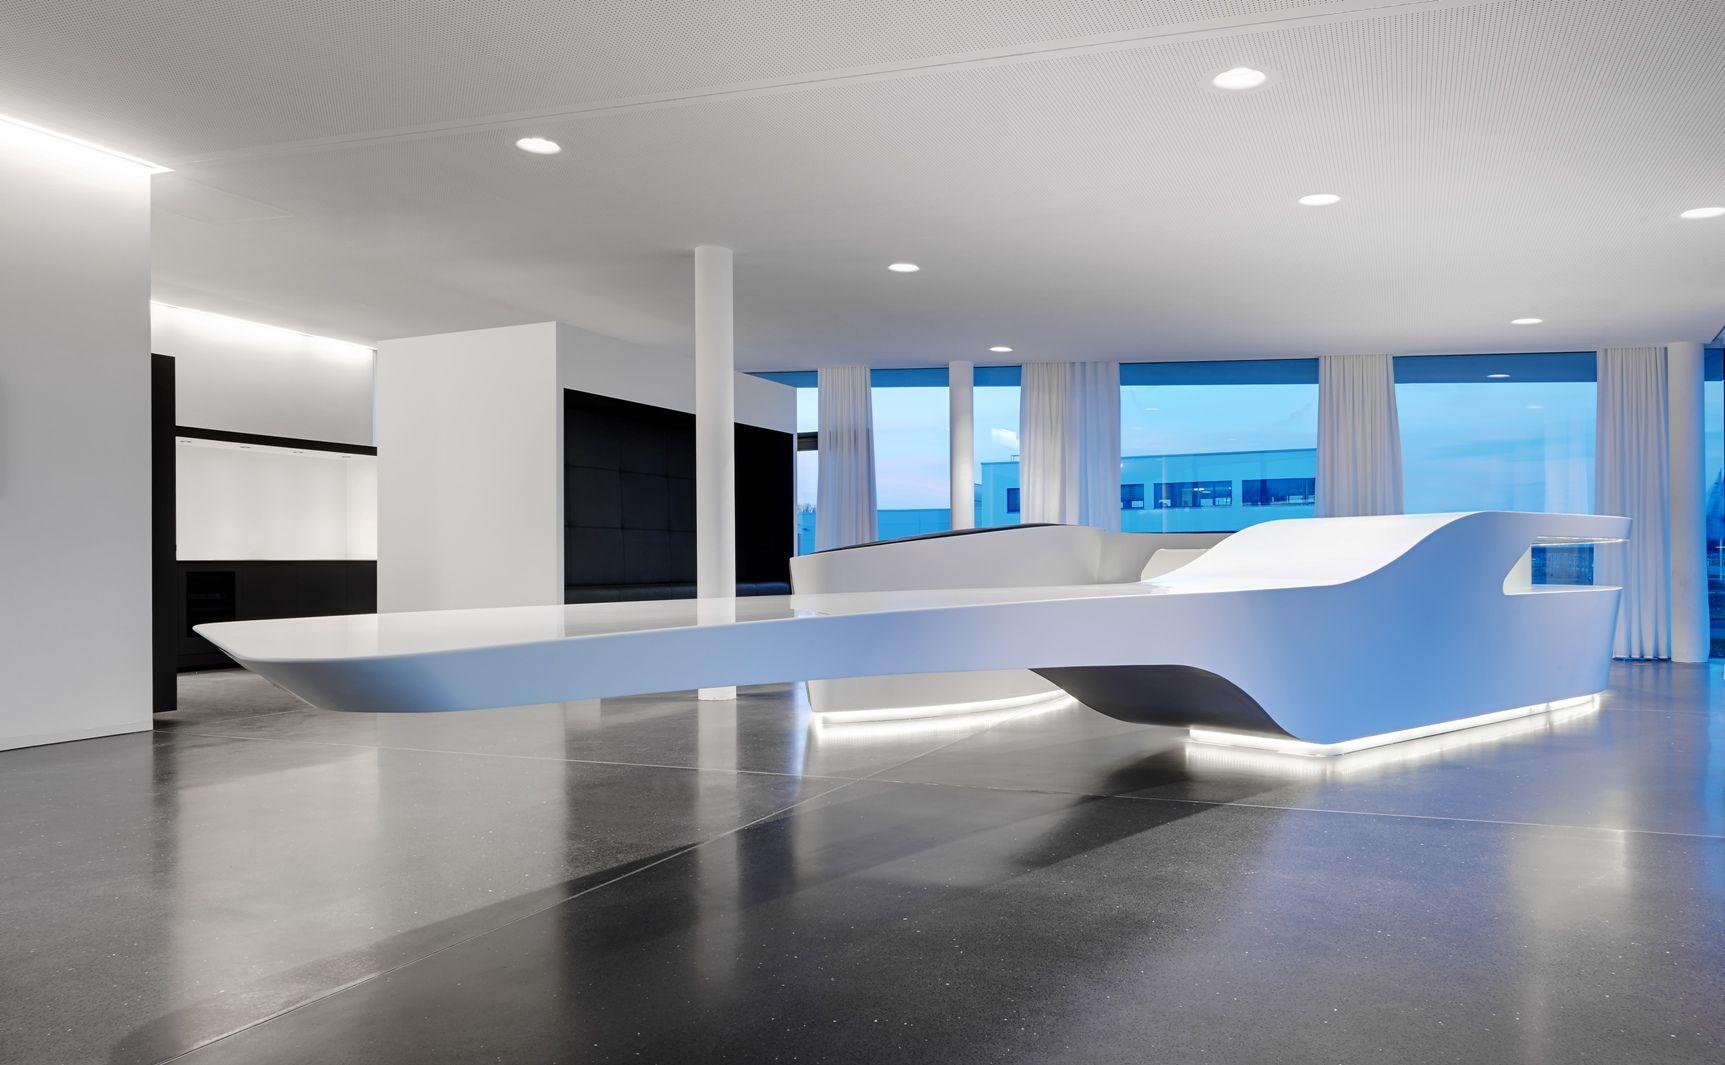 monovolume - Arch. Patrick Pedò  Arch. Juri Pobitzer Bolzano - Lighting concept: Eurolicht GmbH Bolzano. - Foto: Fitistudio Jürgen Eheim Bolzano